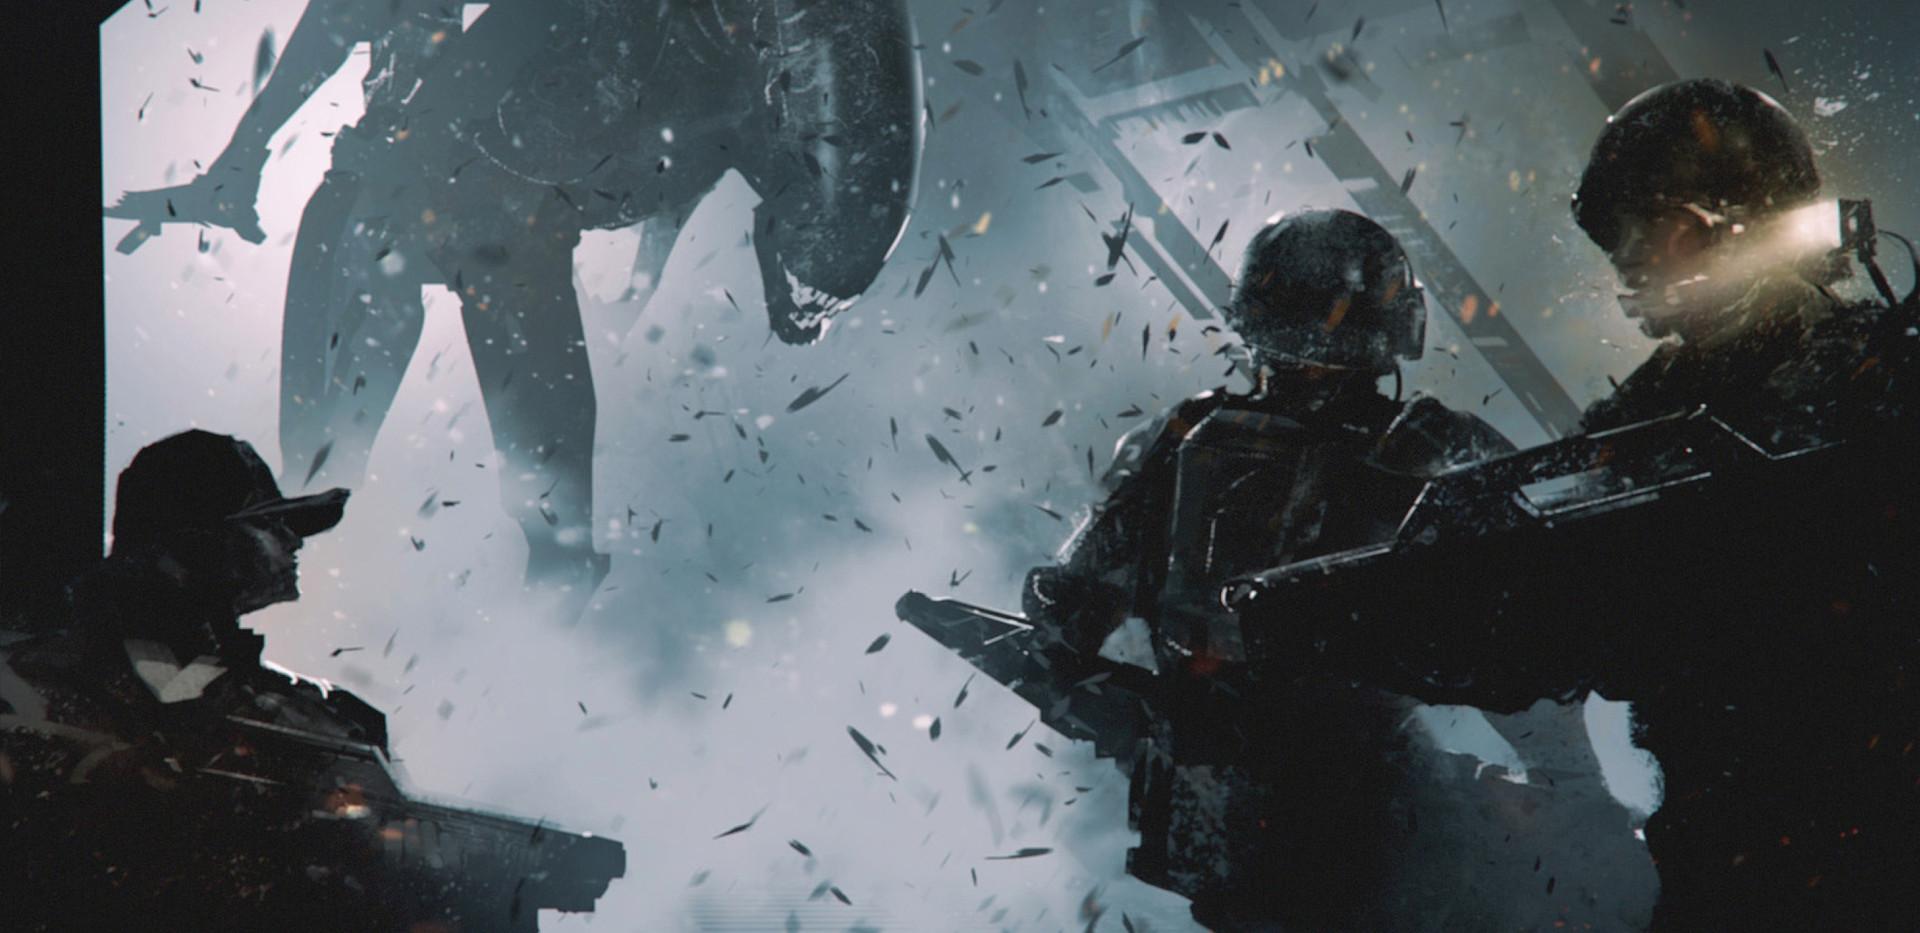 Destroyer_of_Worlds_cover.jpg